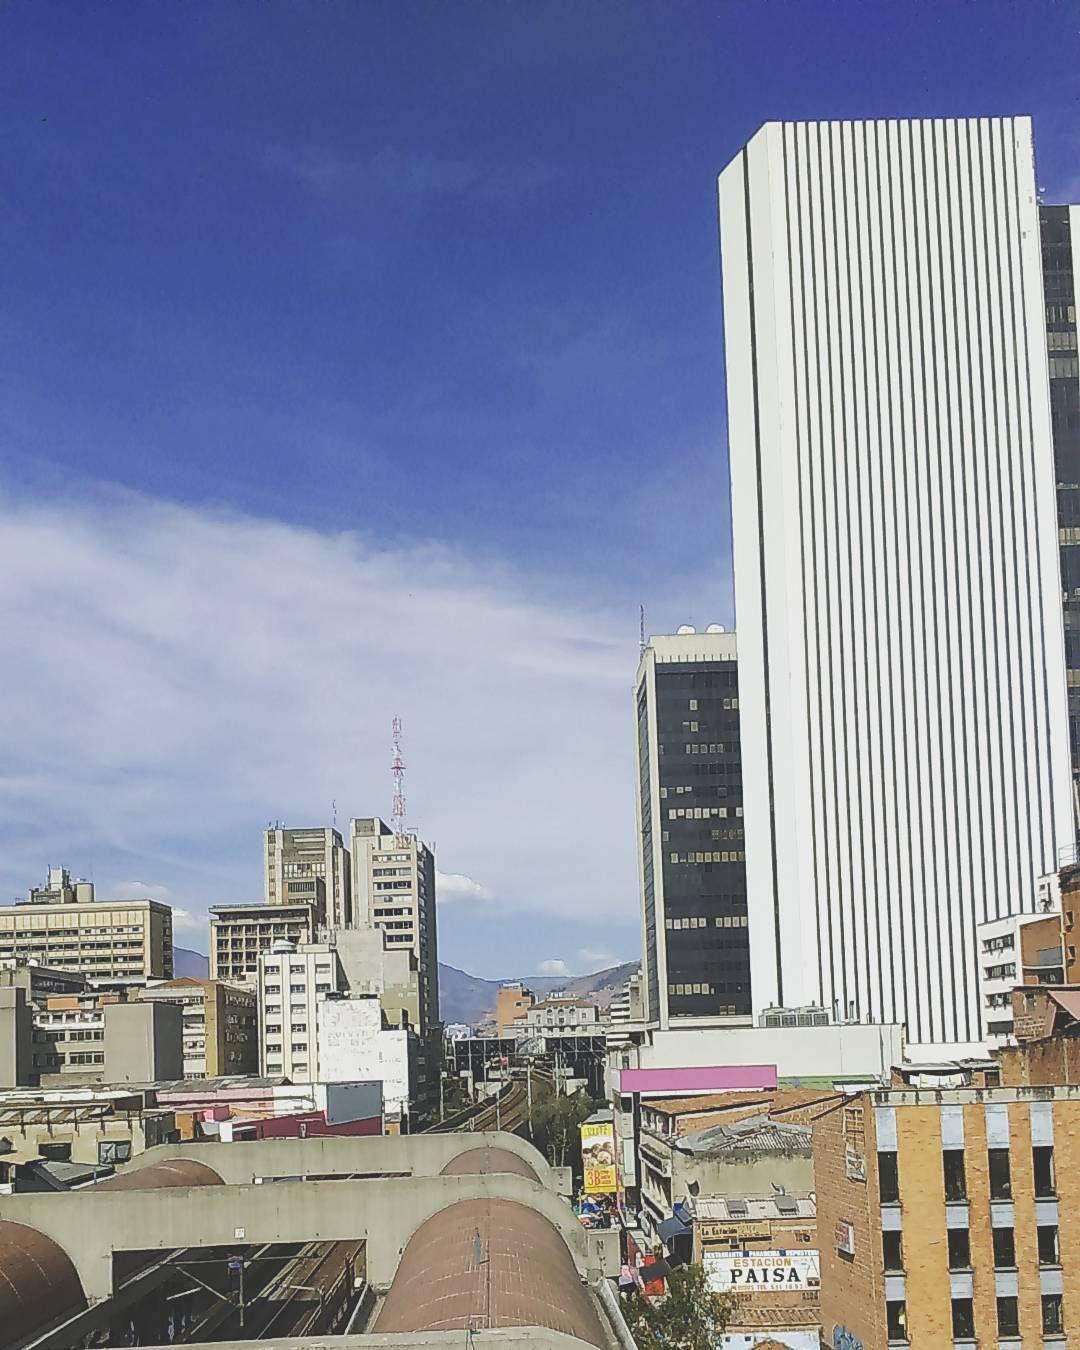 Te amo Medellín by yeqo